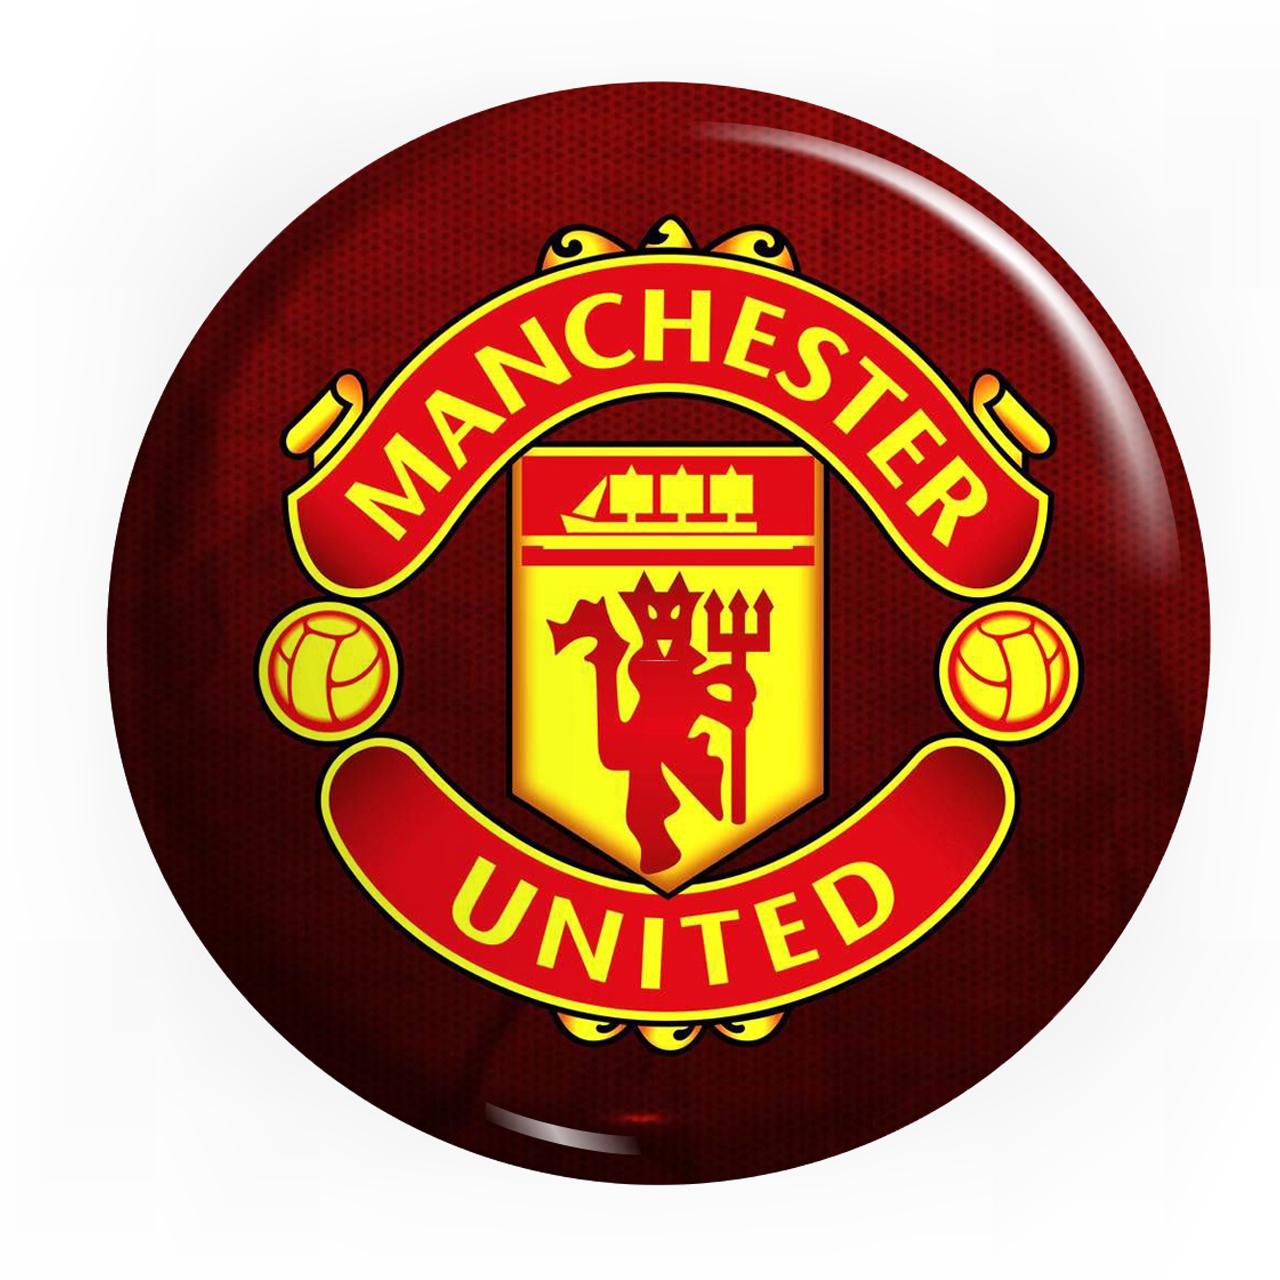 عکس پیکسل تیداکس طرح تیم منچستر یونایتد فوتبالی کد TiD012